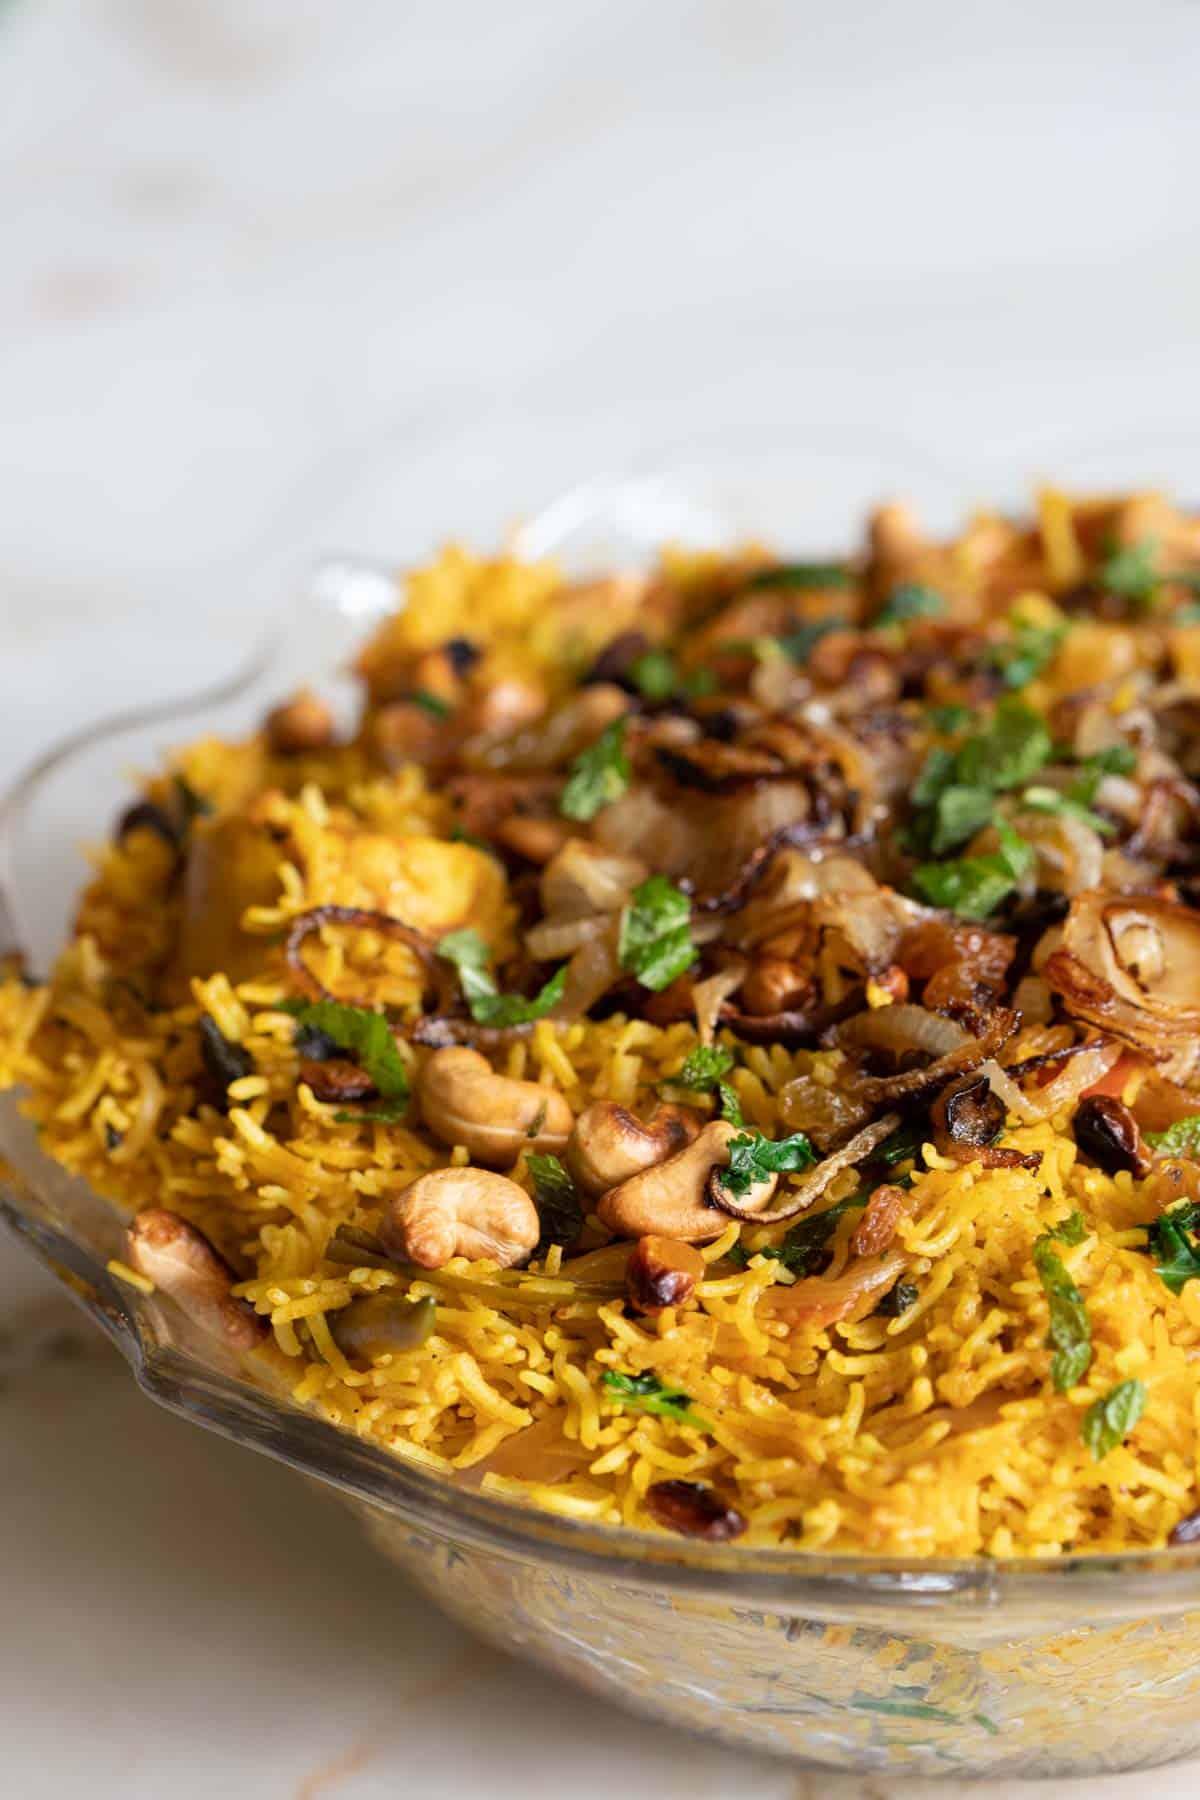 chicken biryani rice in a clear bowl